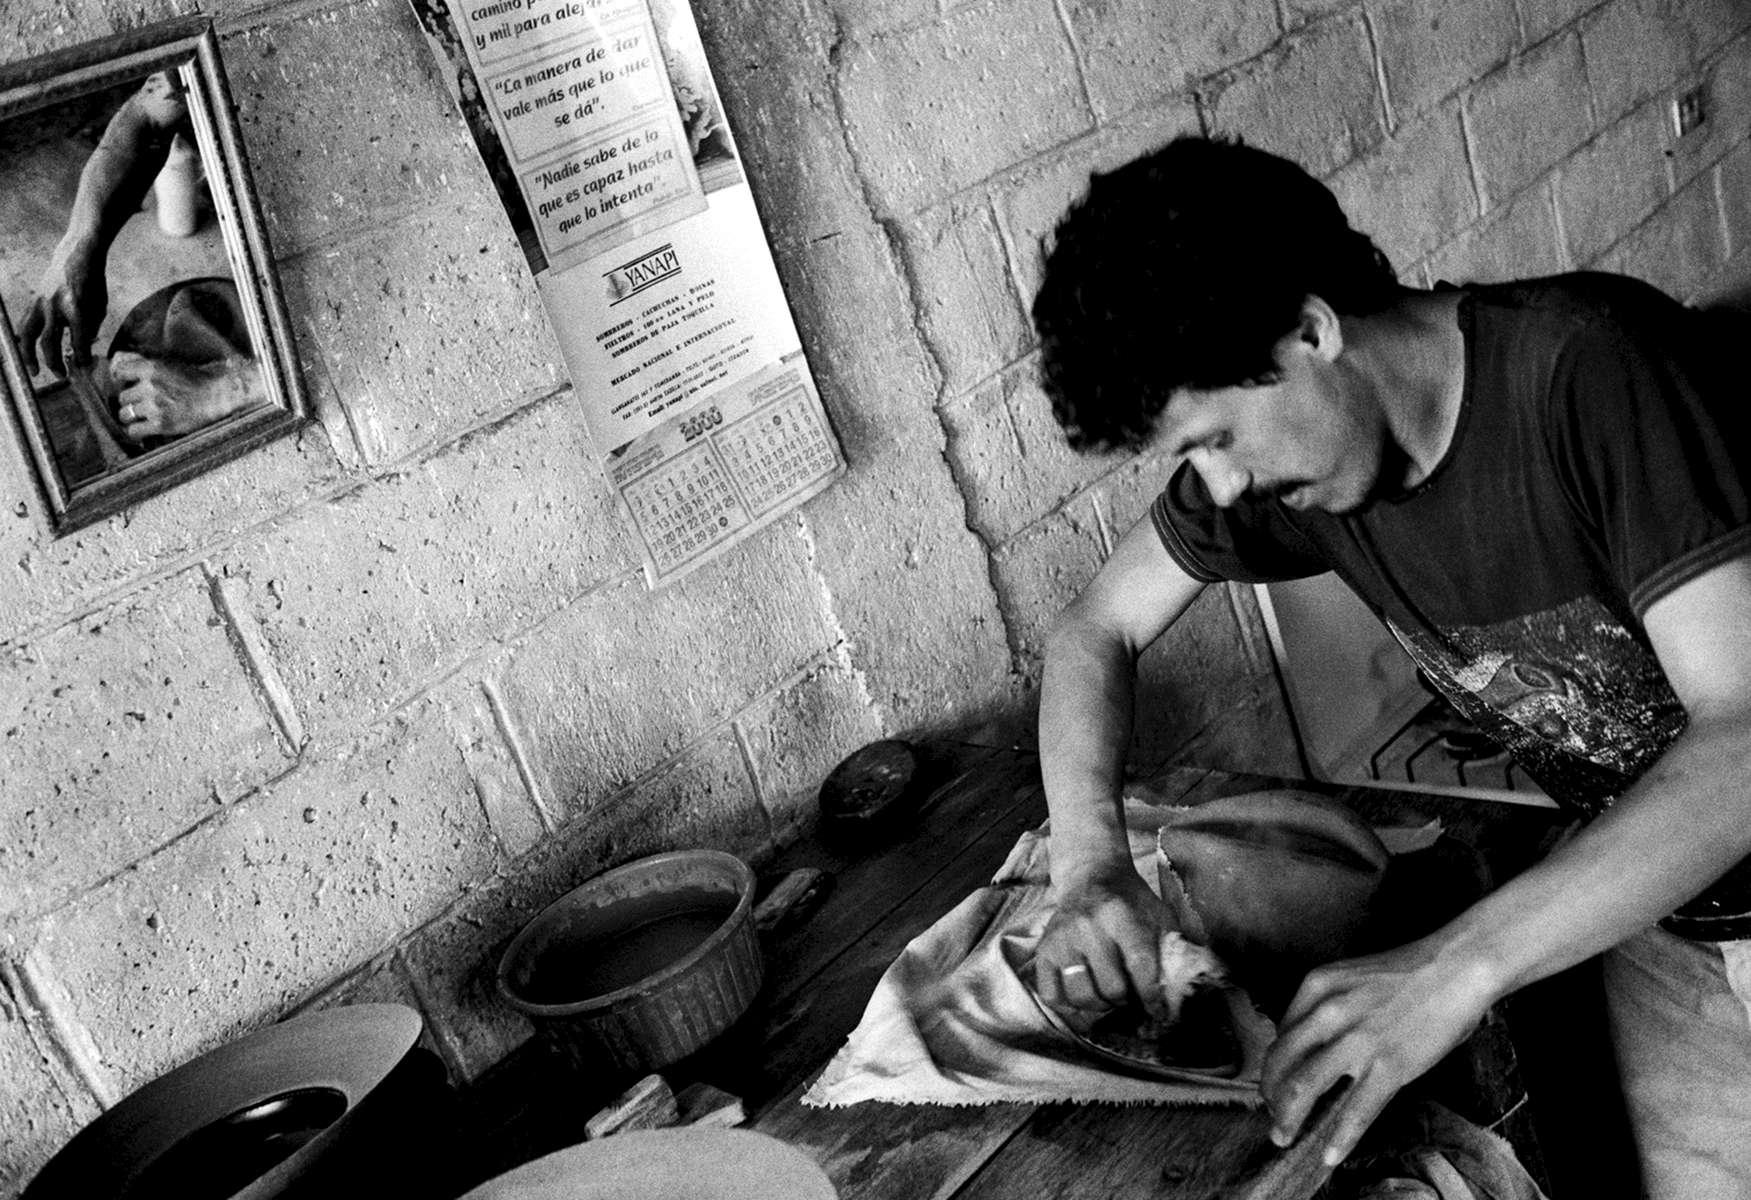 Hat Maker in Ibarra, Ecuador 2001